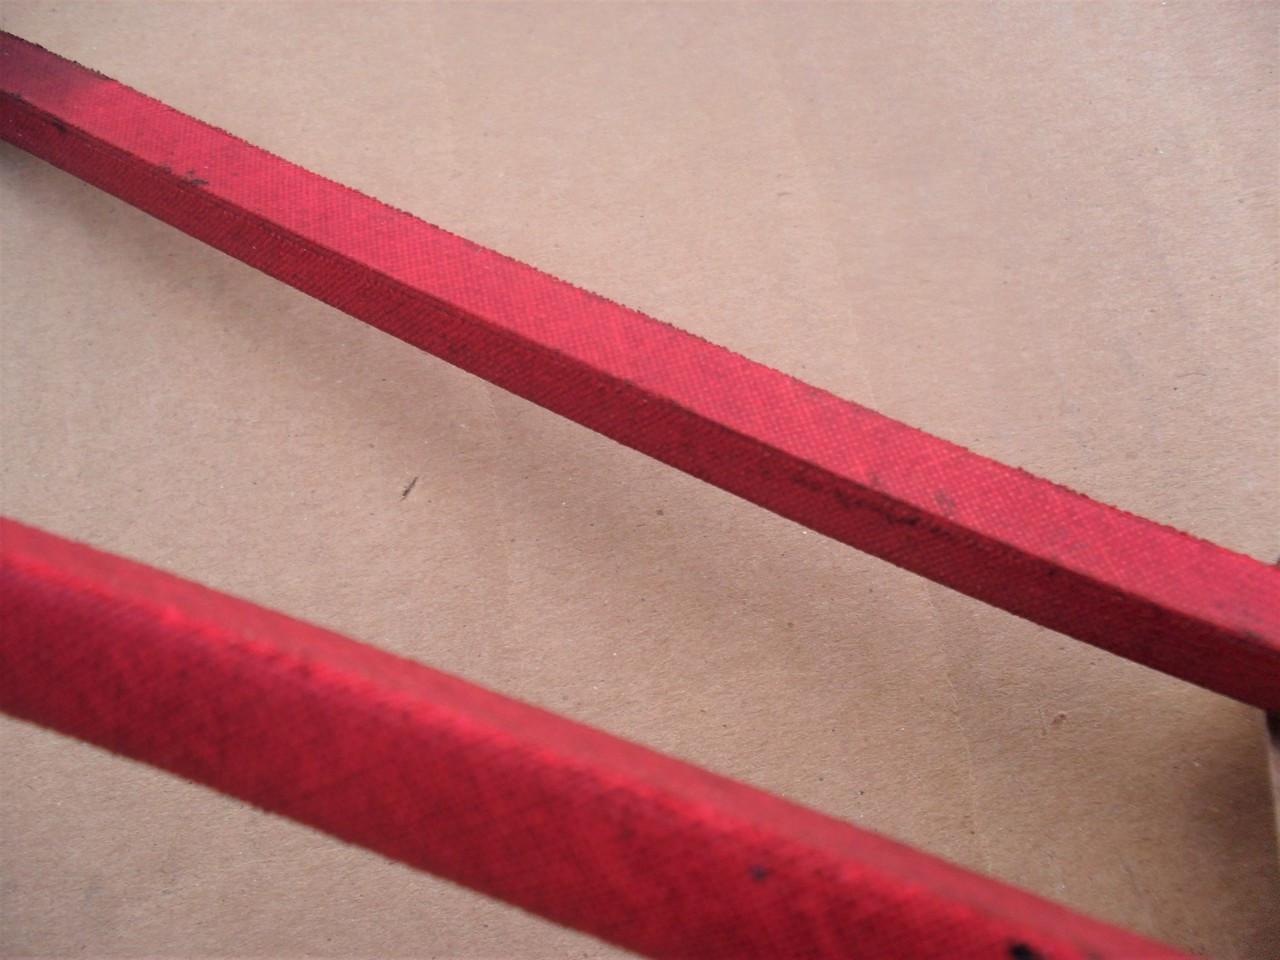 Belt for Gilson 11901, 211664, 37169, Made in USA